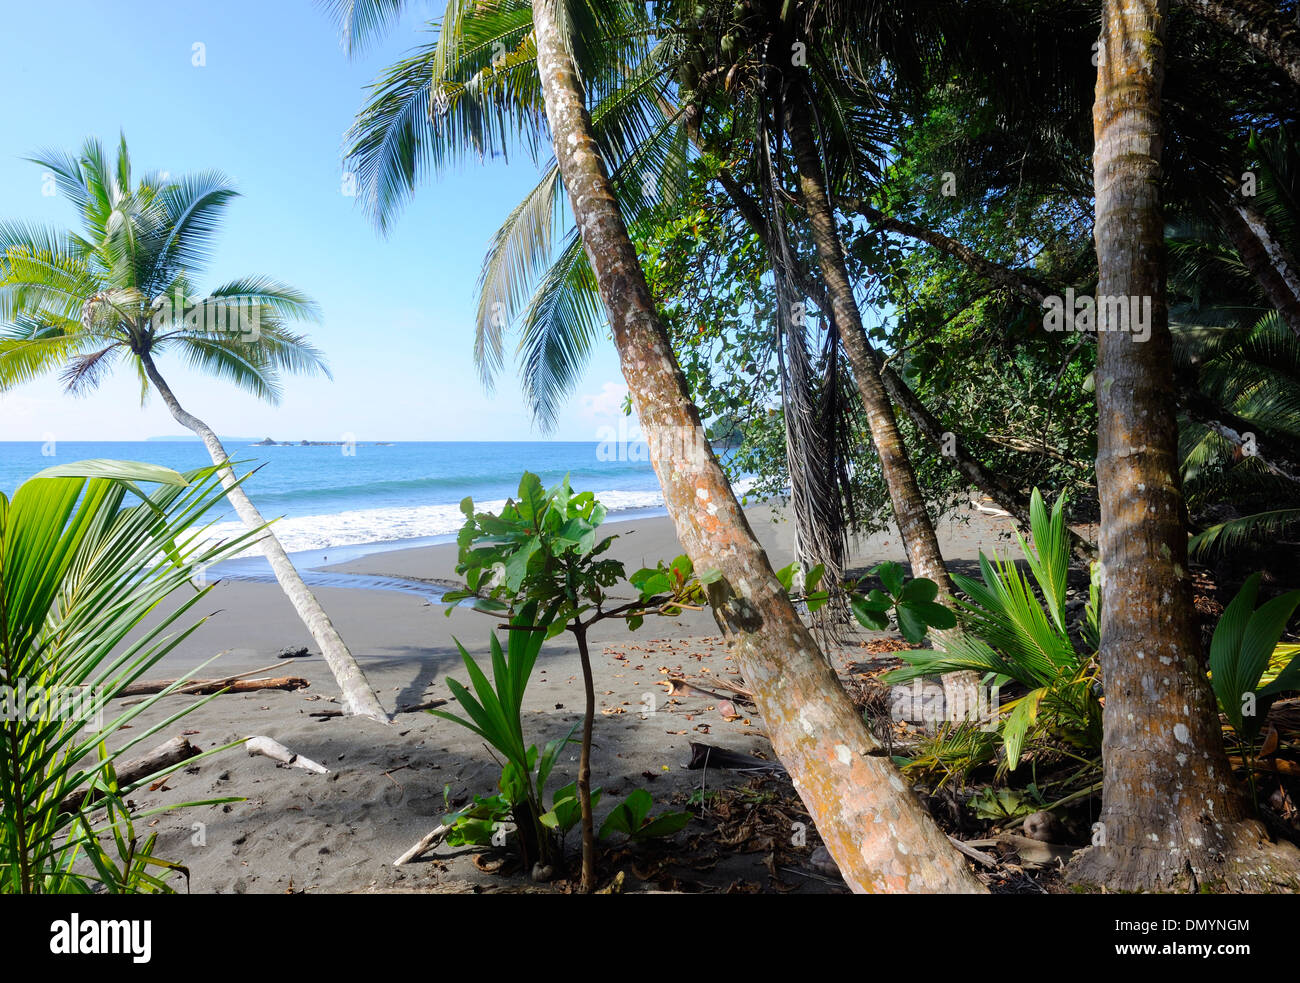 A coconut palms (Cocos nucifera) grow on an idylic sandy beach. Drake Bay, Corcovado National Park, Golfito, Costa Rica. - Stock Image